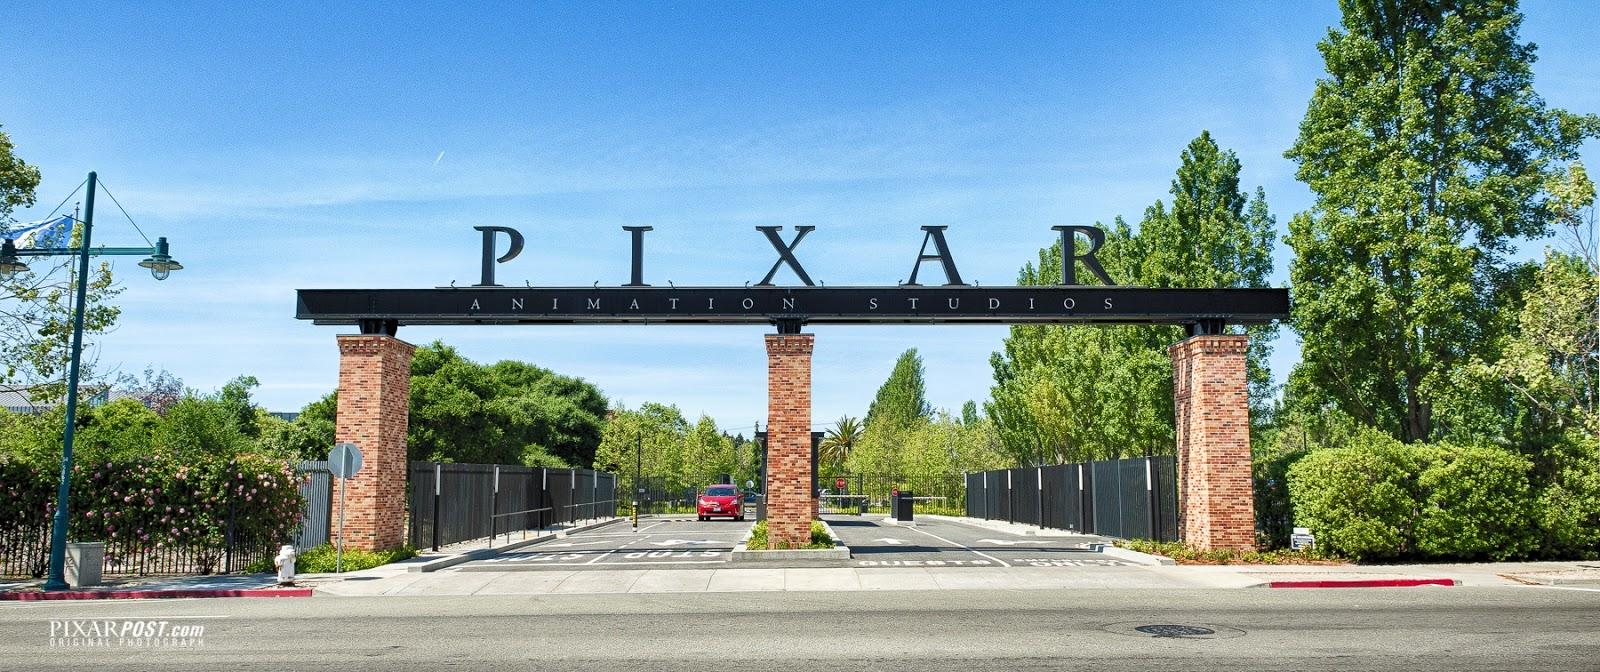 Building  Universal Studios Gate